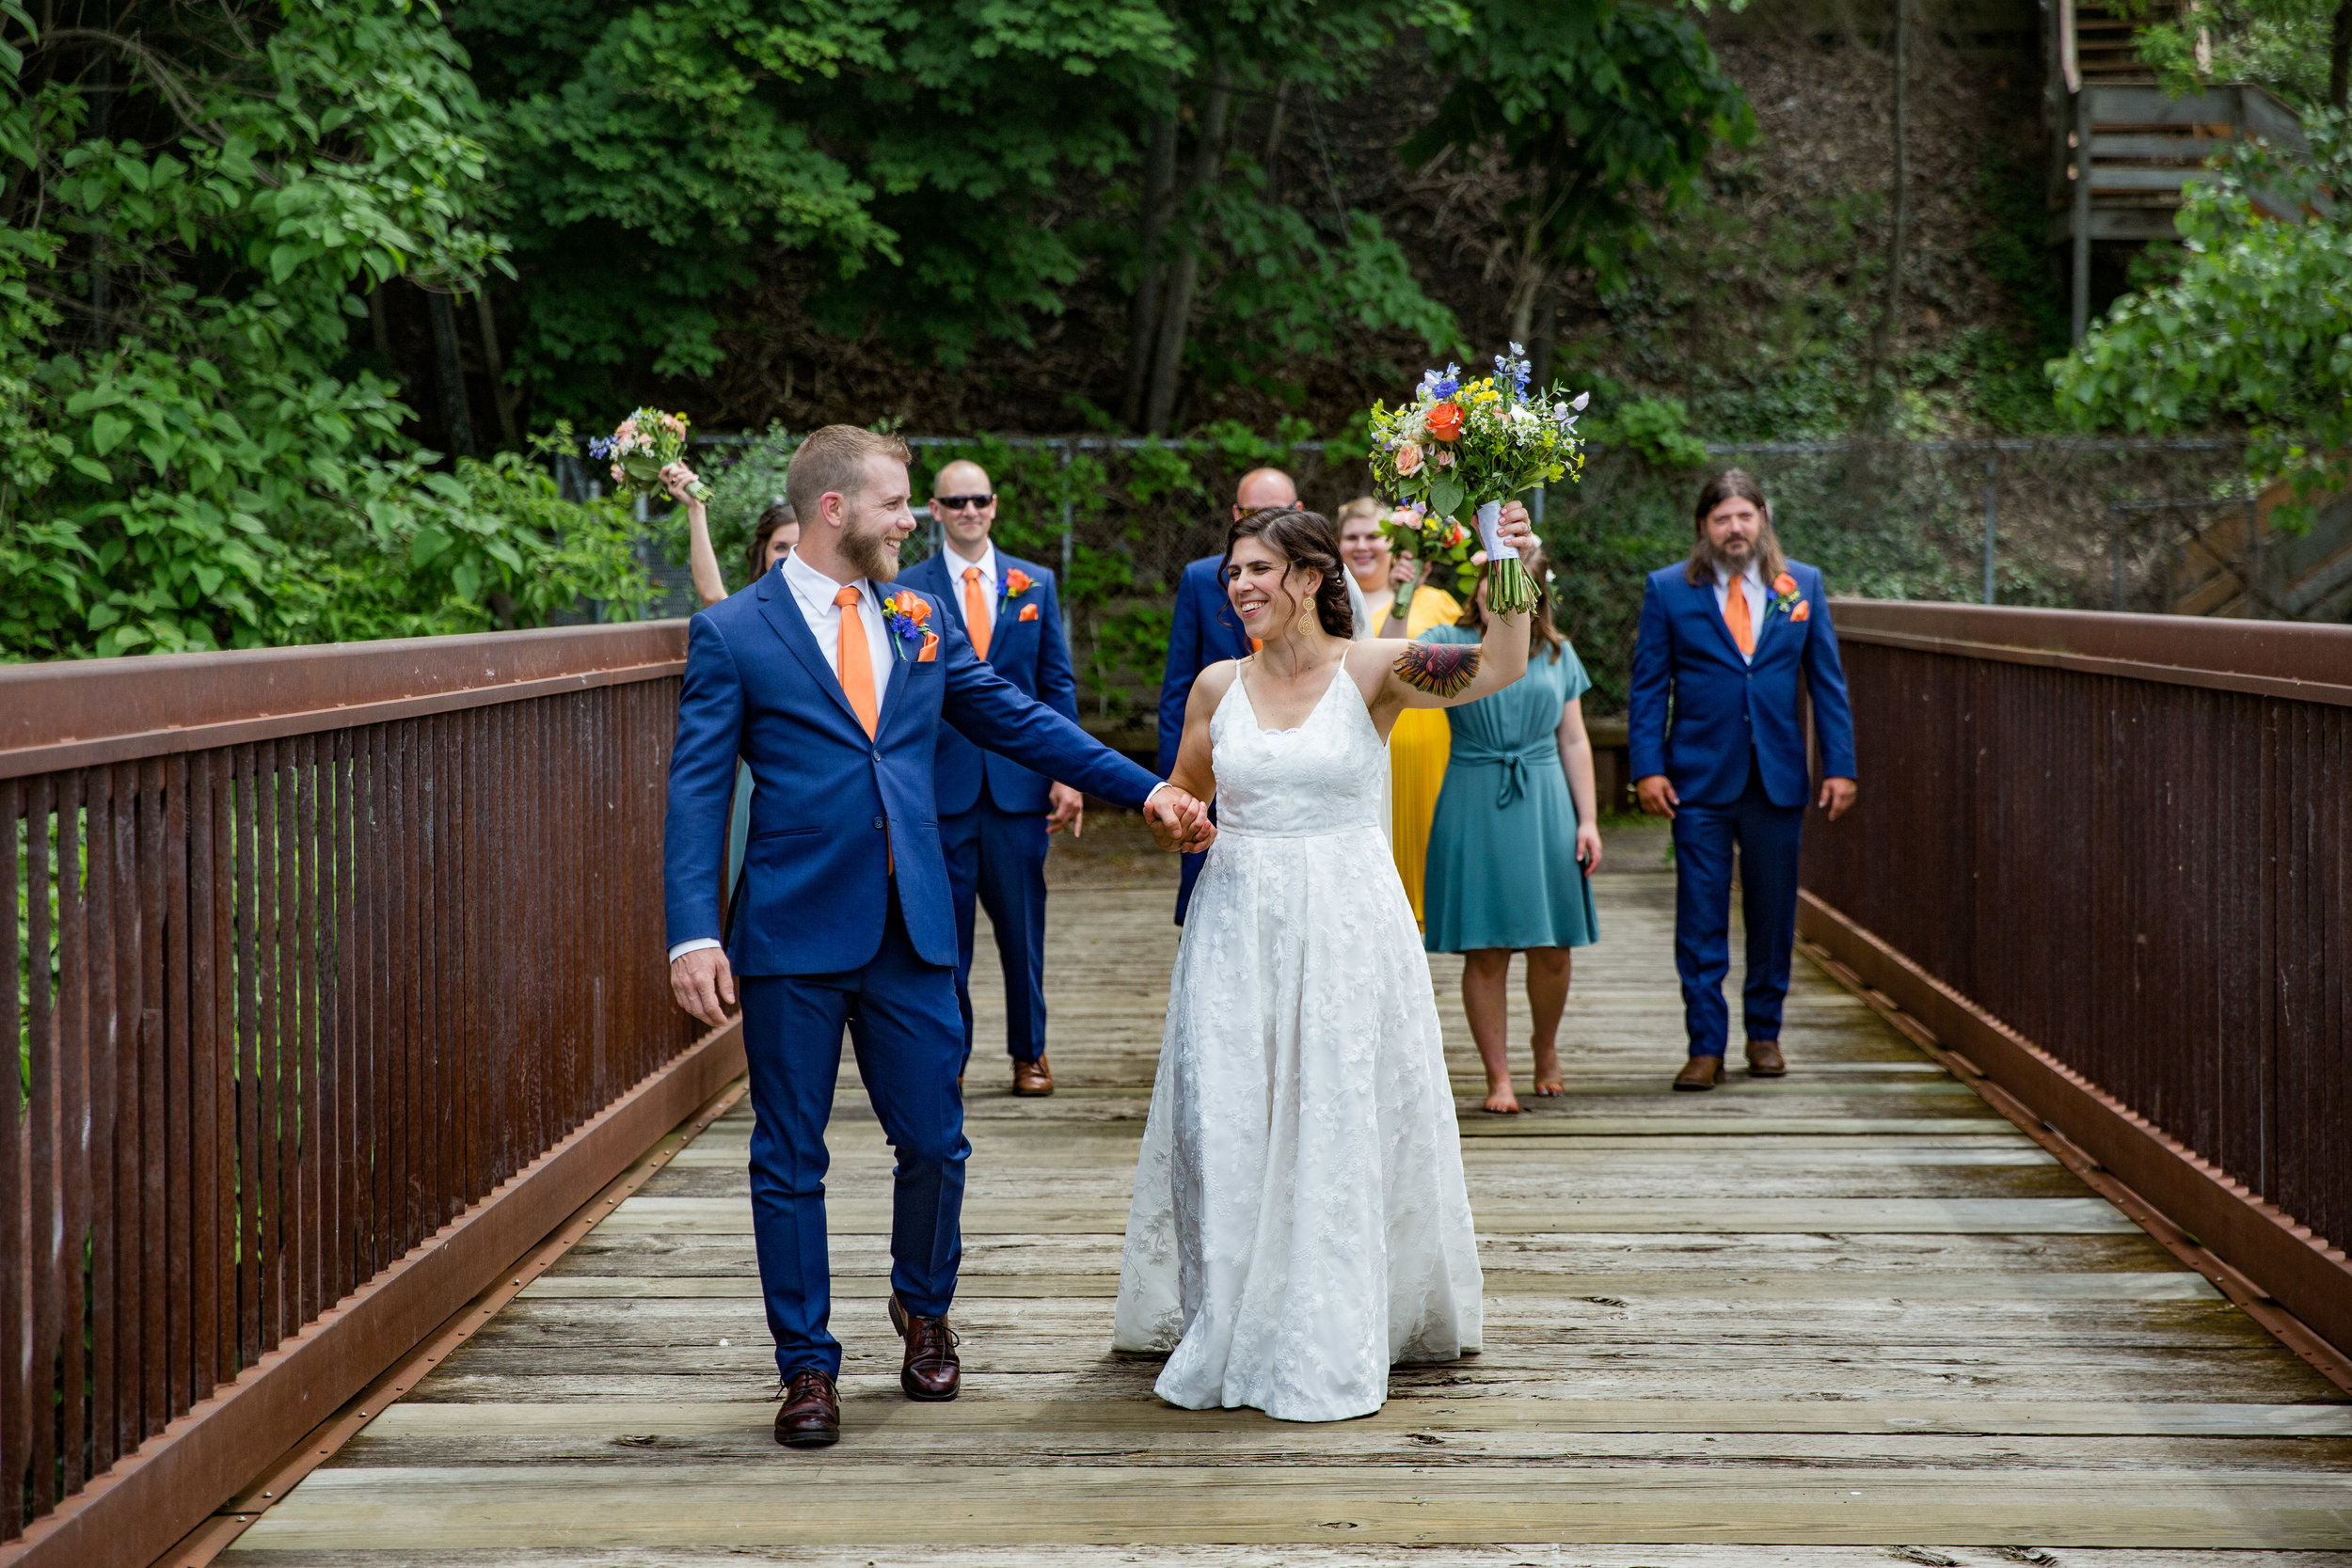 Natalie and Dallas Mooney Wedding 6-8-19_Tania Watt Photography-245.jpg